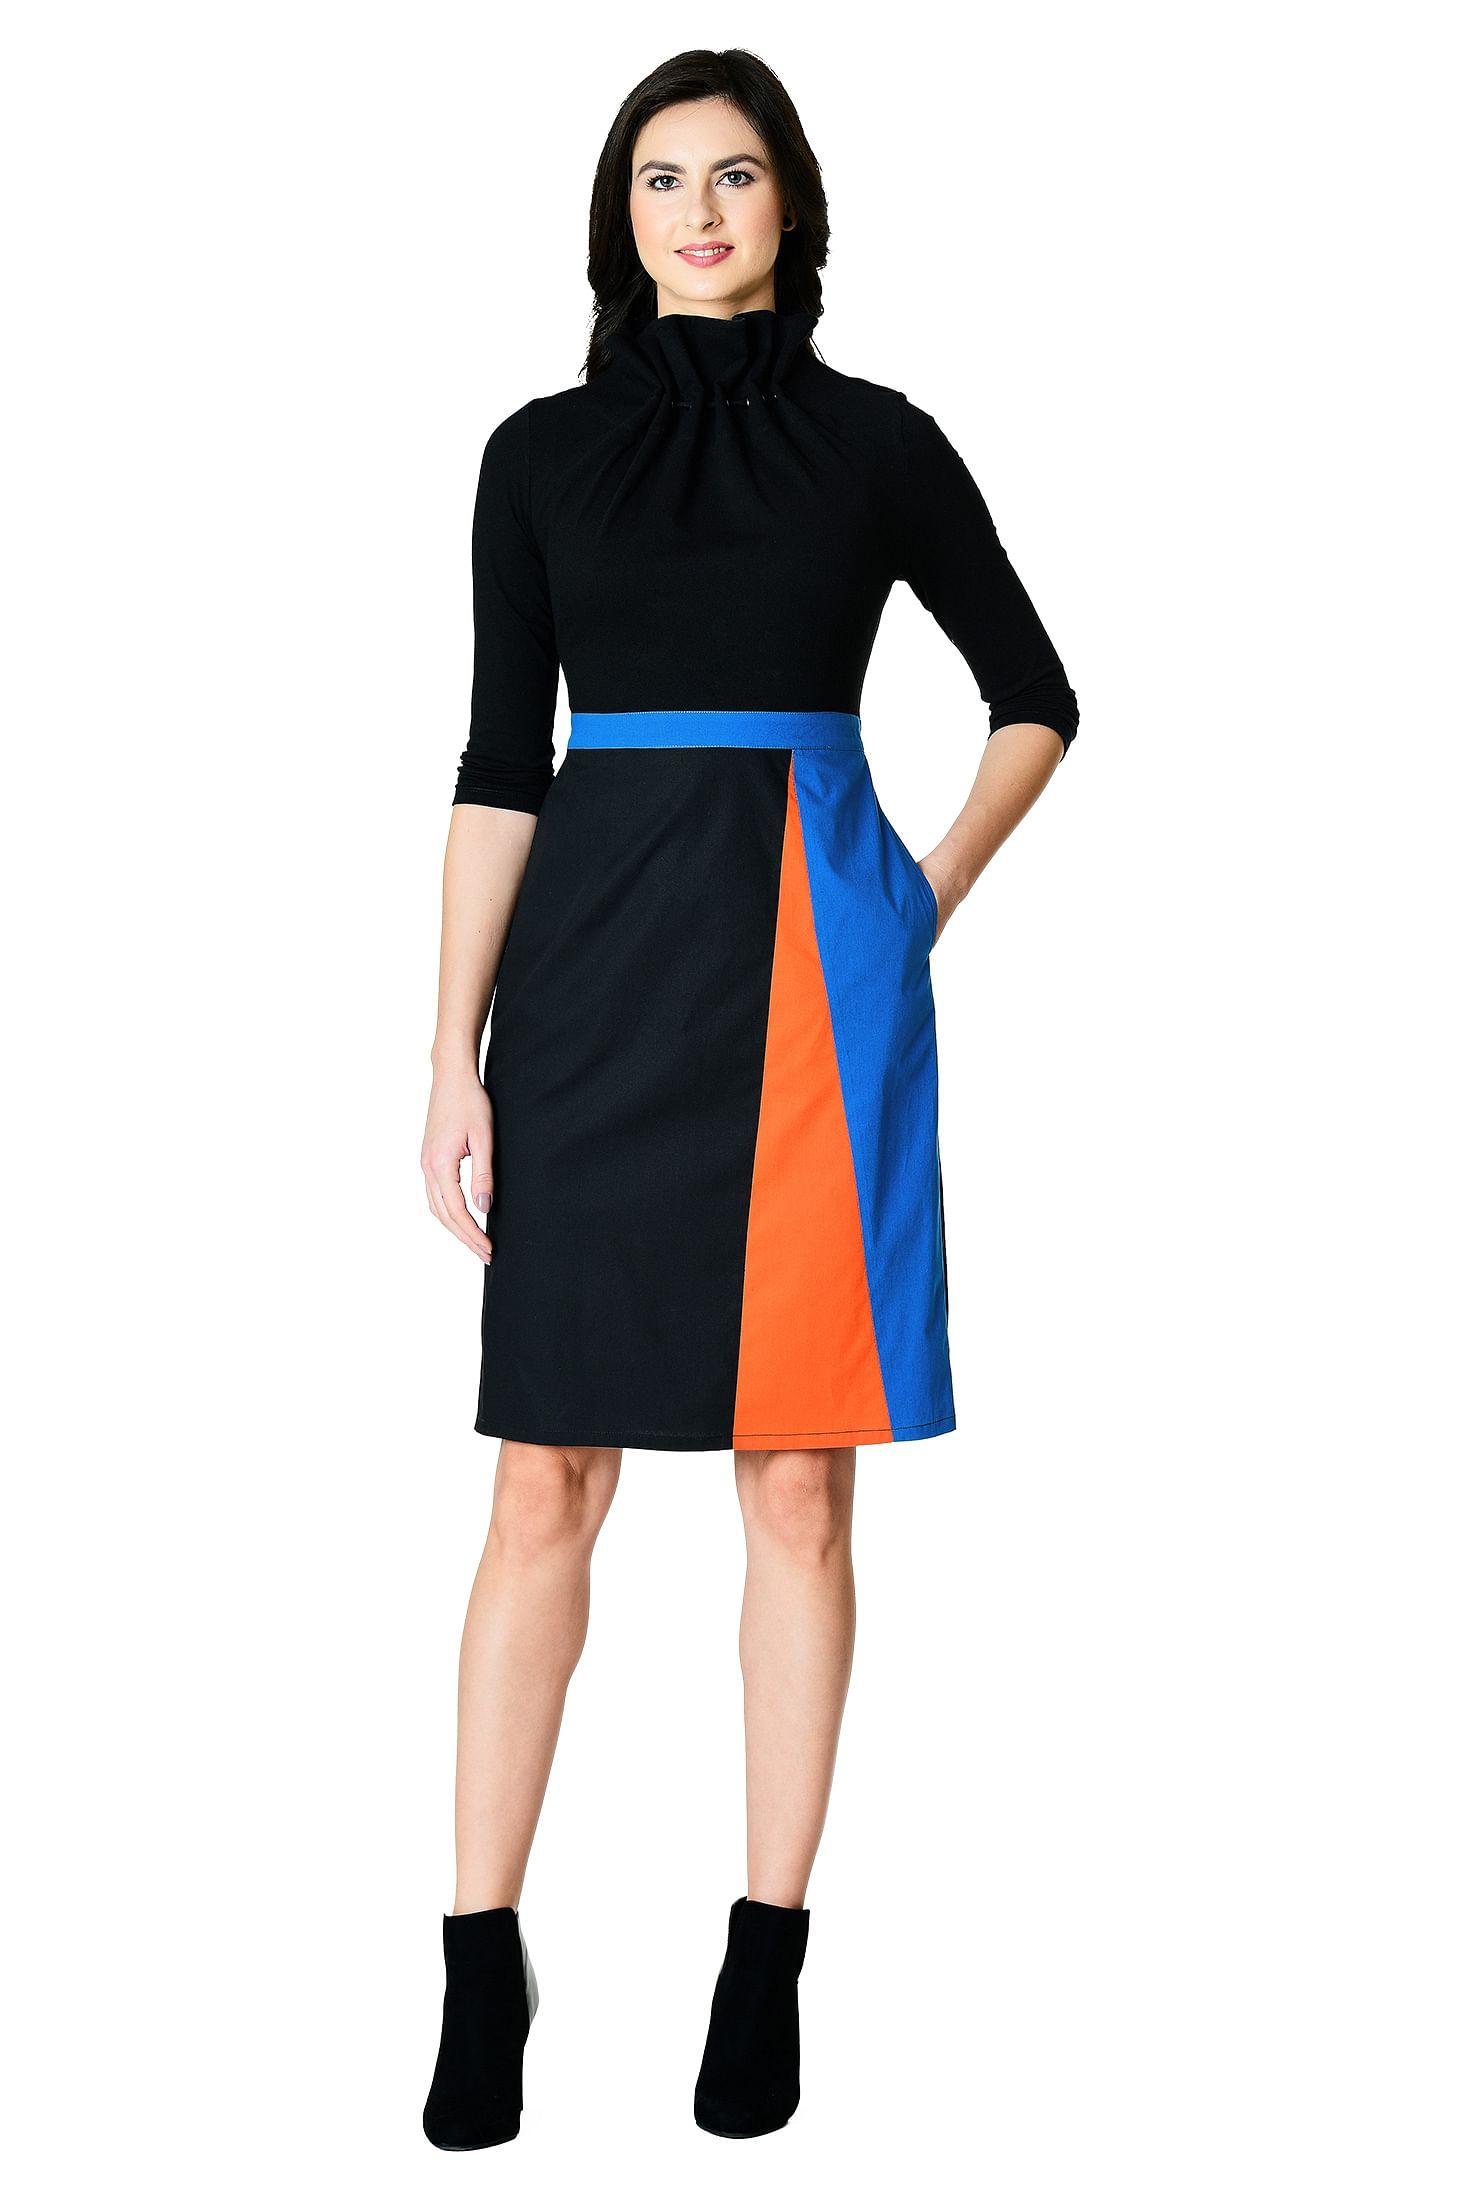 3ac4acfe Above knee length dresses, black/true blue/wood fired orange dresses,